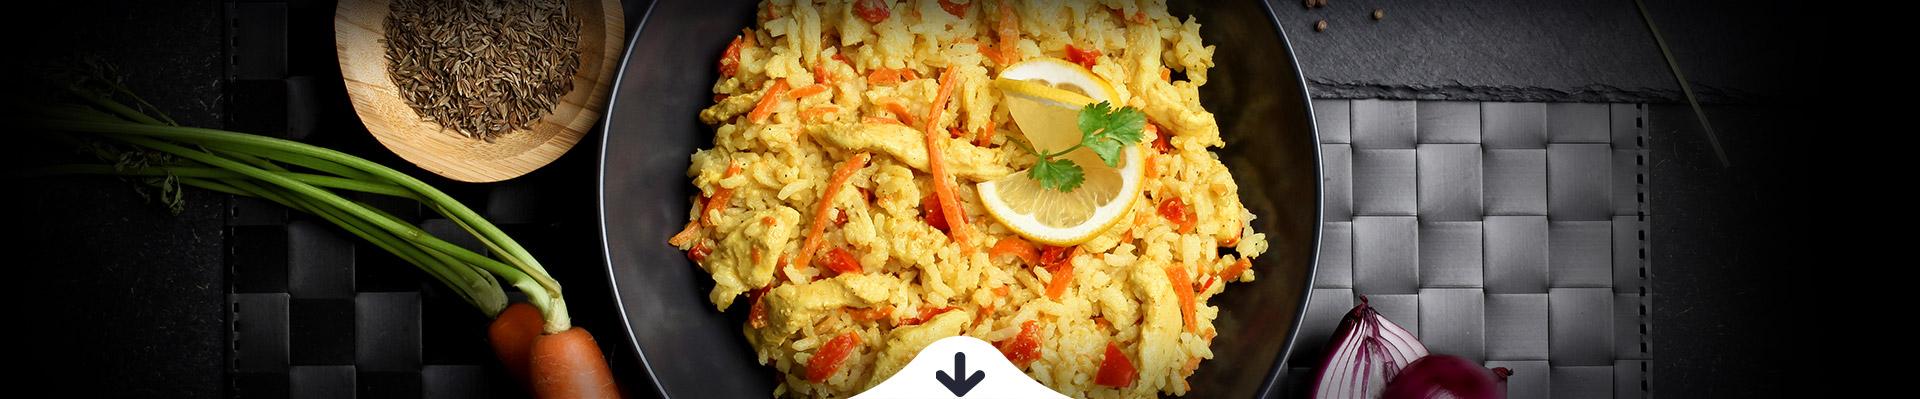 HELLO FOOD Ázsiai currys csirke párolt rizzsel